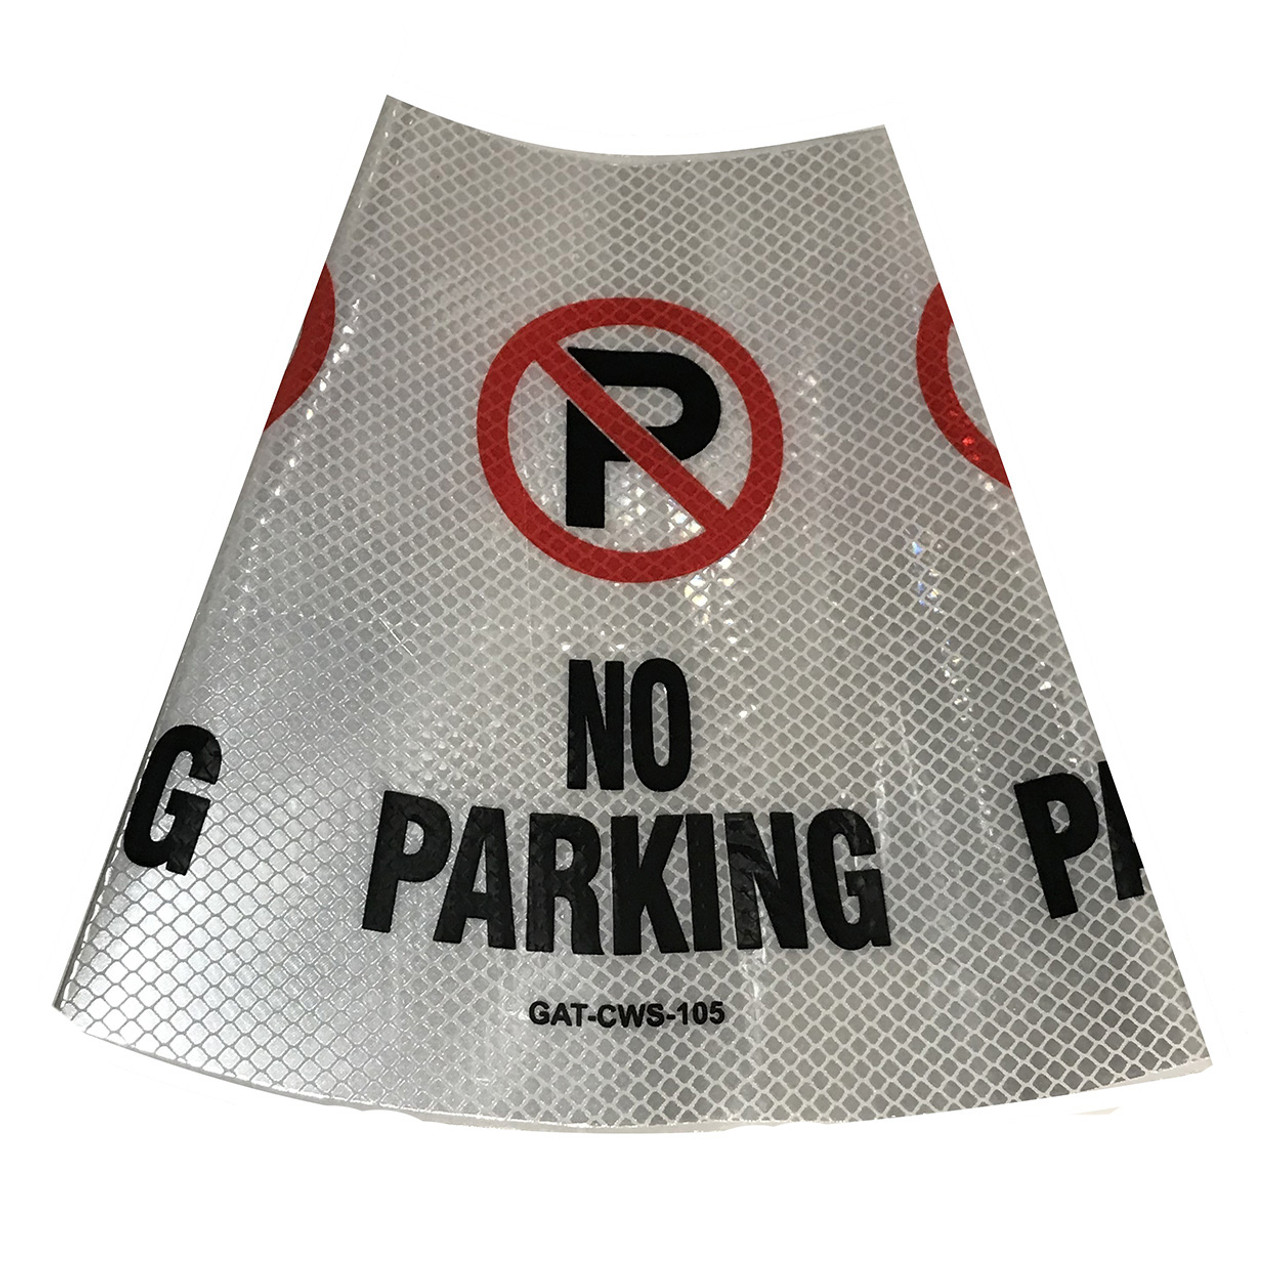 No parking Safety Cone Collar - Reflective-5